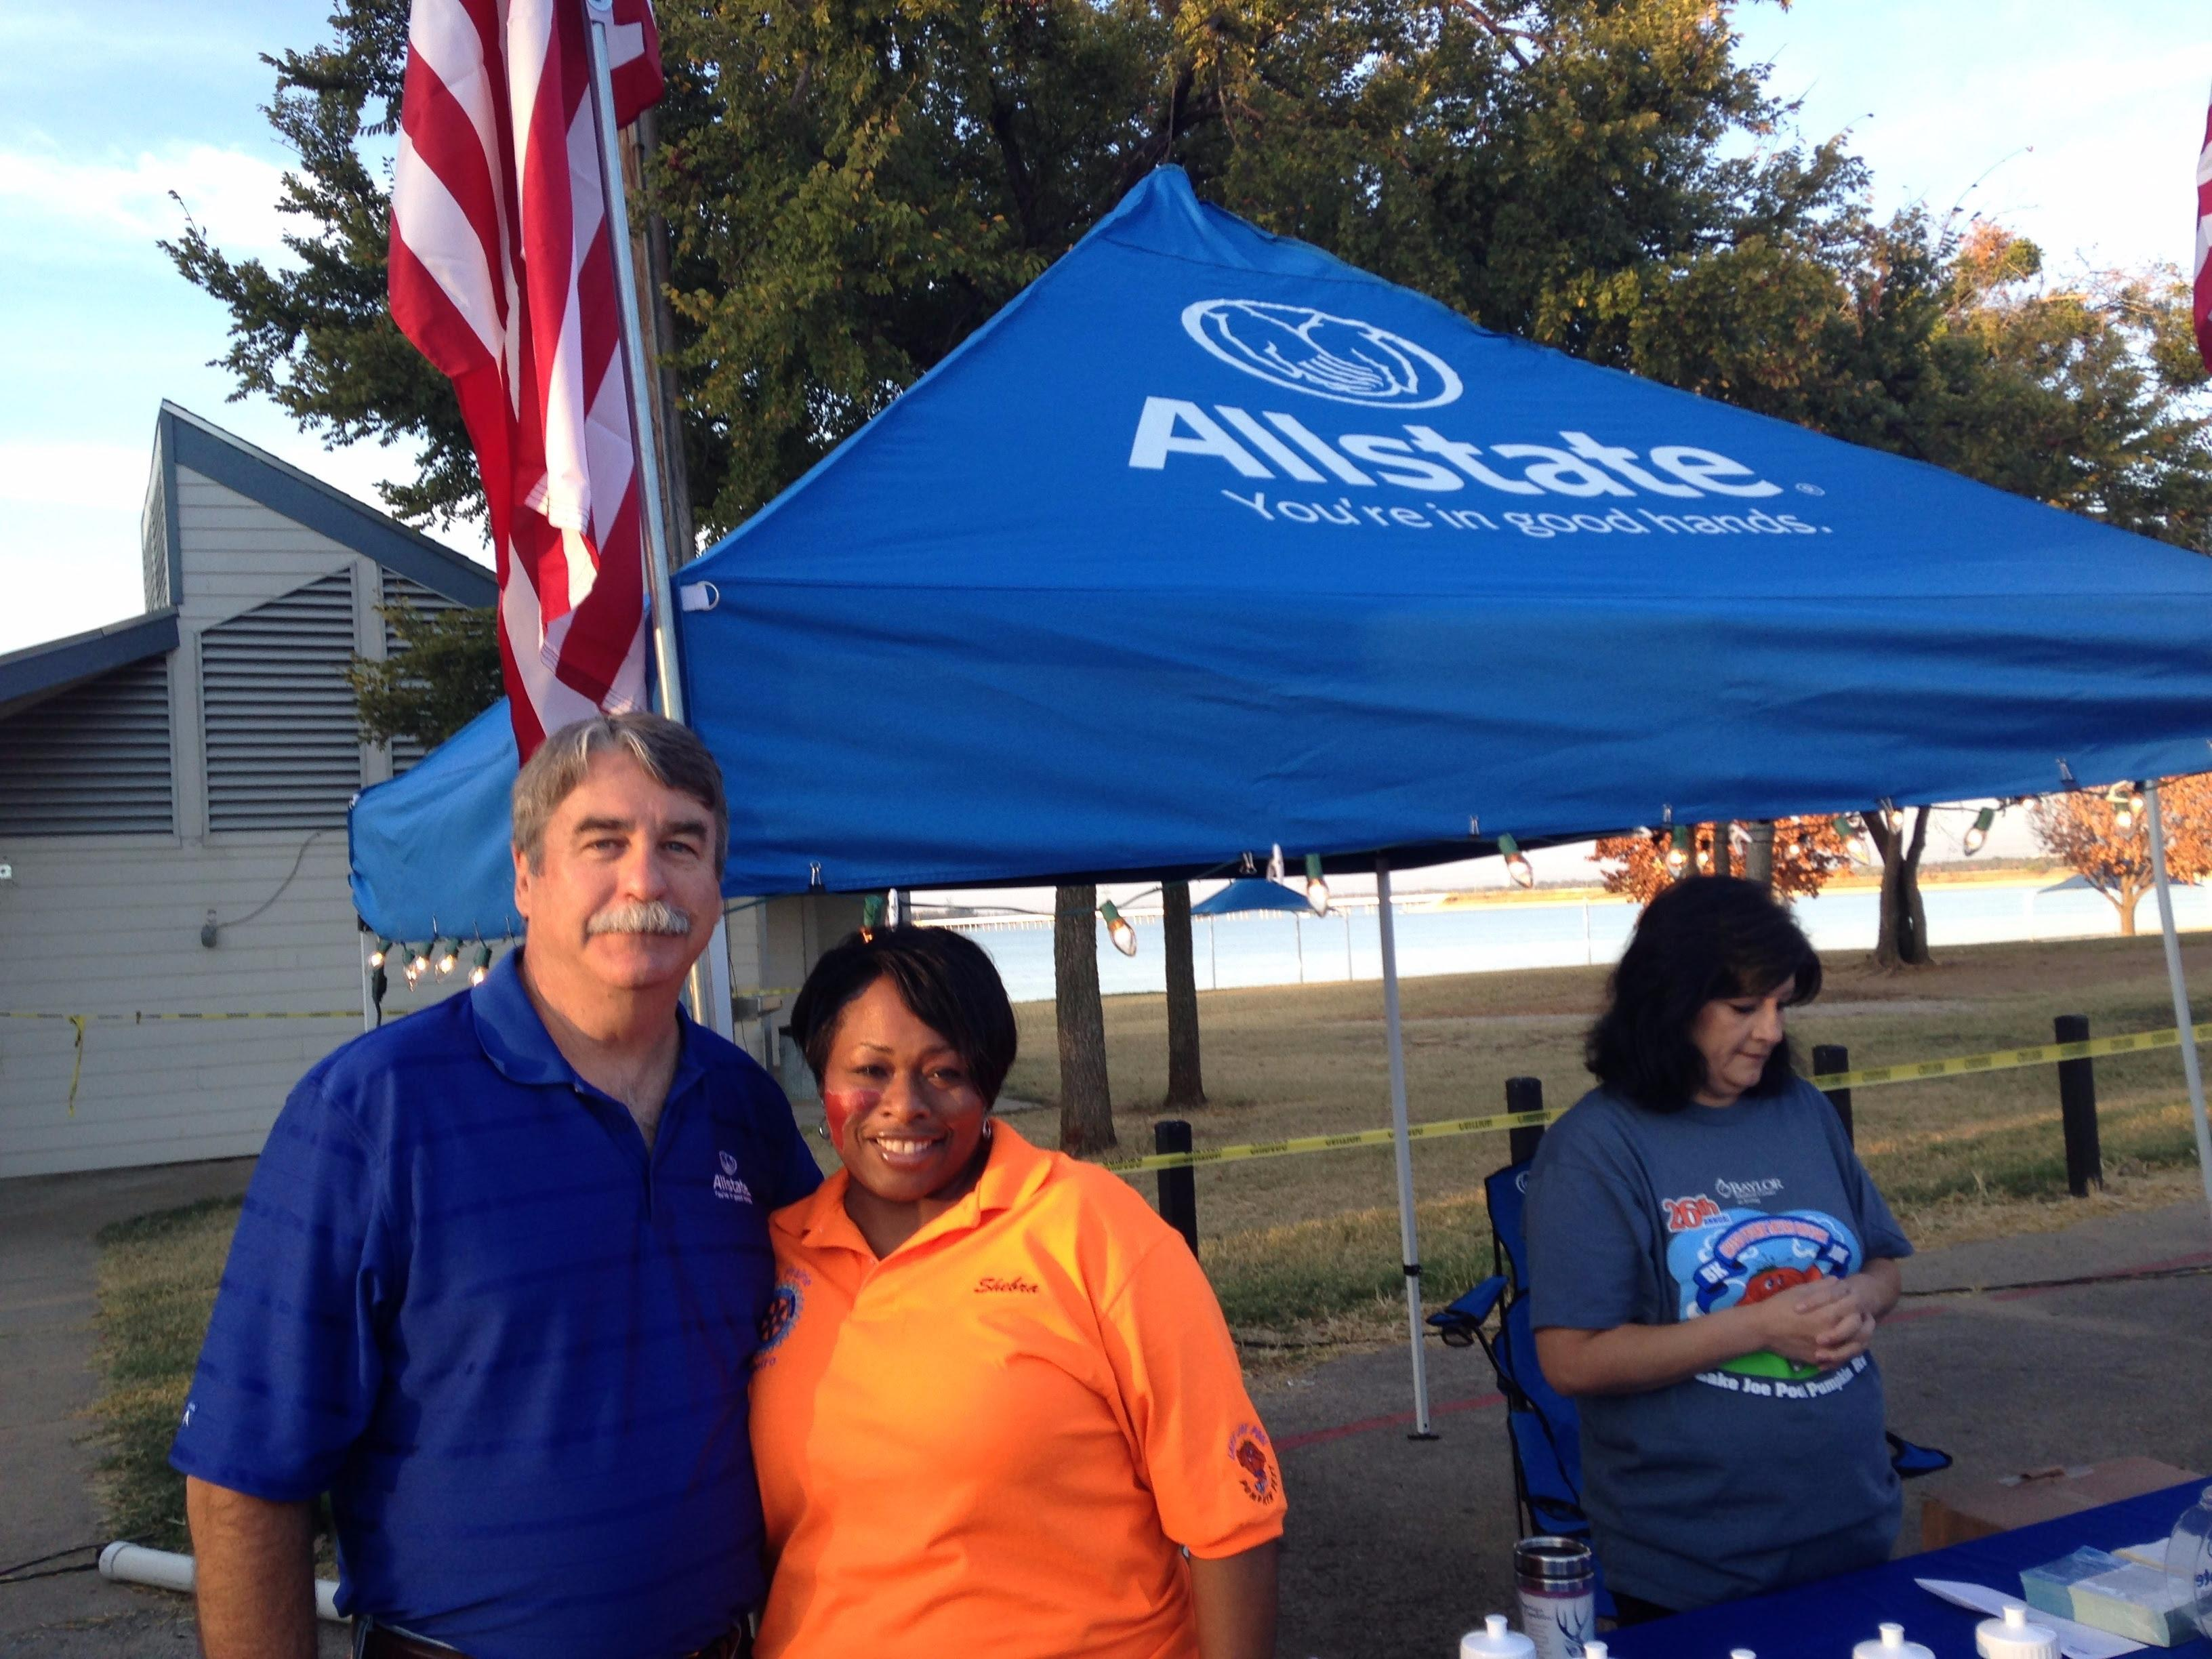 Shebra Hackett: Allstate Insurance image 3